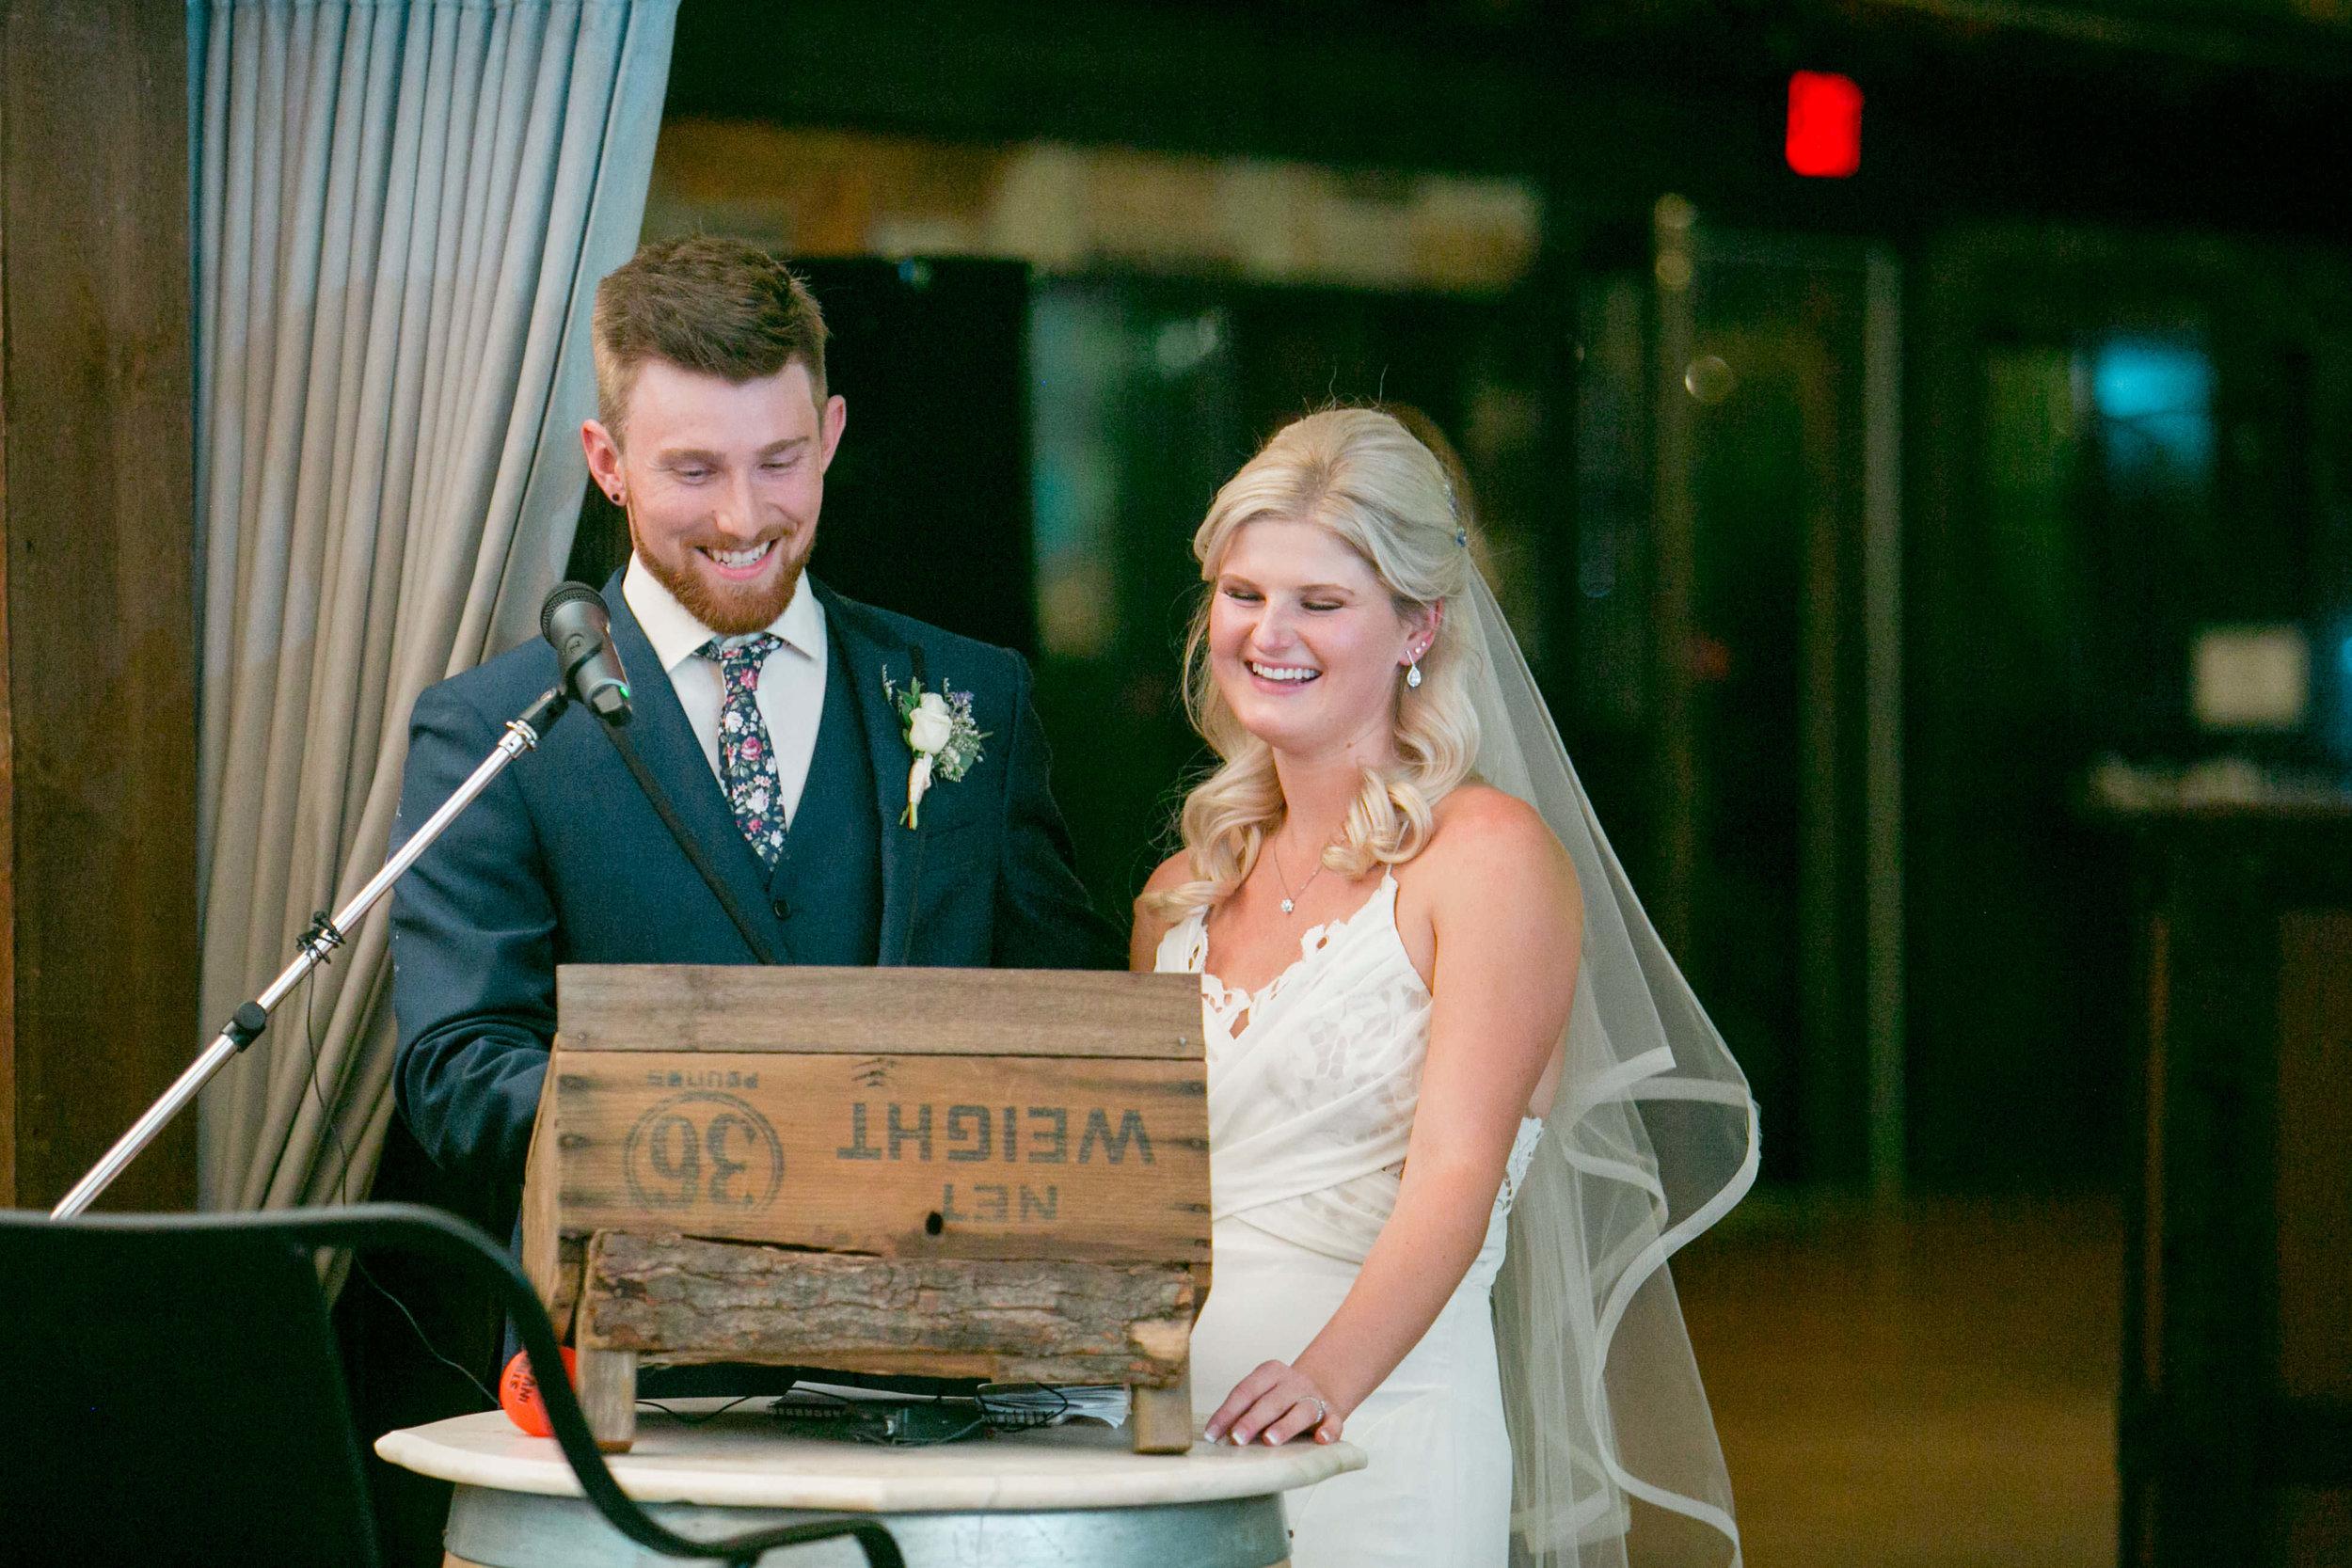 Maddy___Brandon___Daniel_Ricci_Weddings_High_Res._Finals_659.jpg